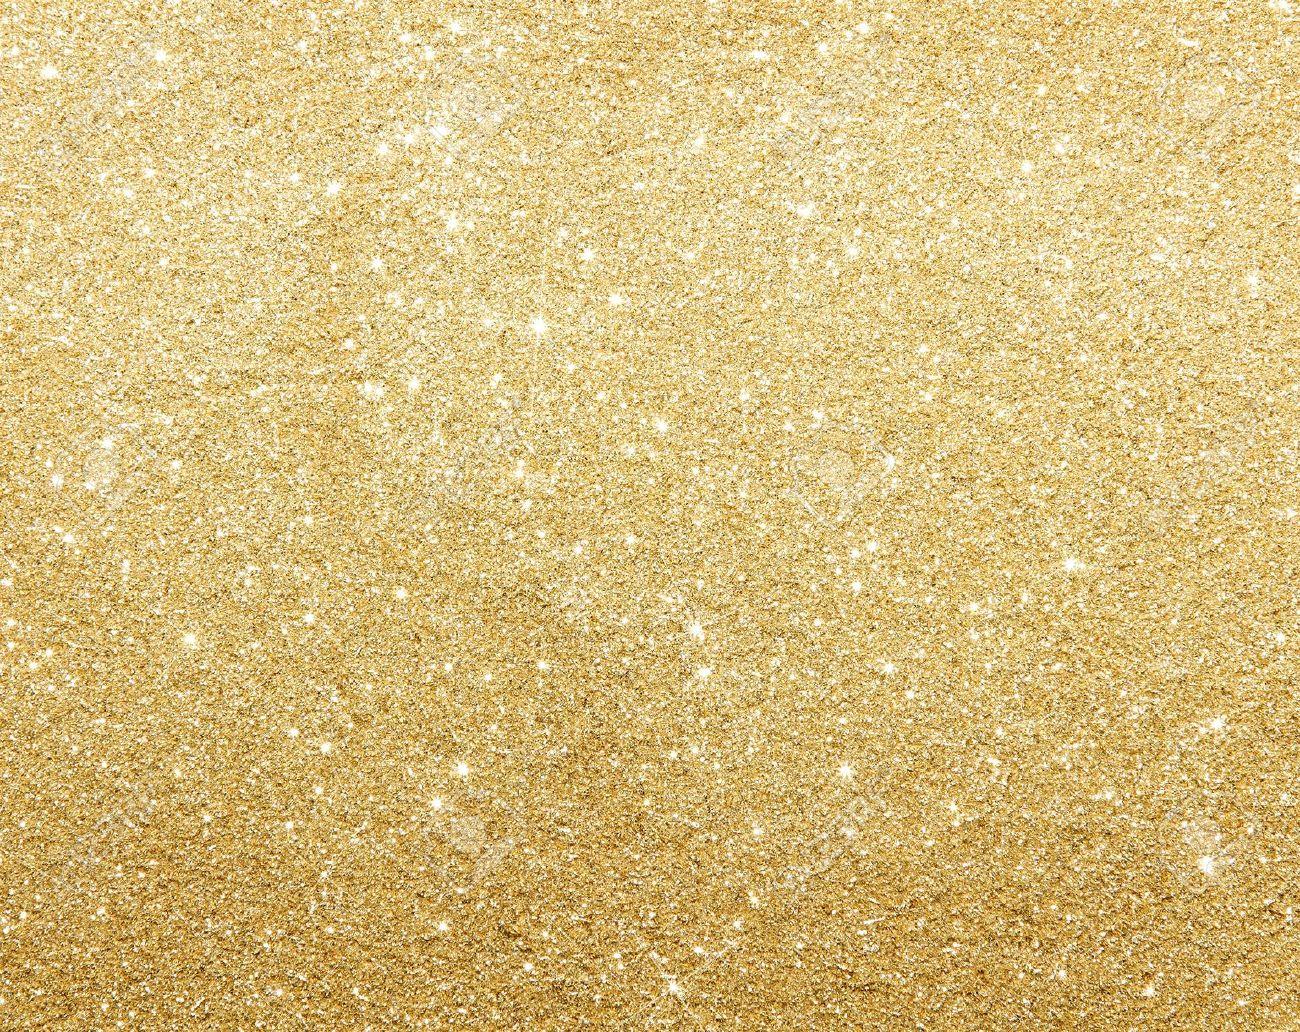 9970428-Glamour-gold-sparkling-background-Stock-Photo-glitter -